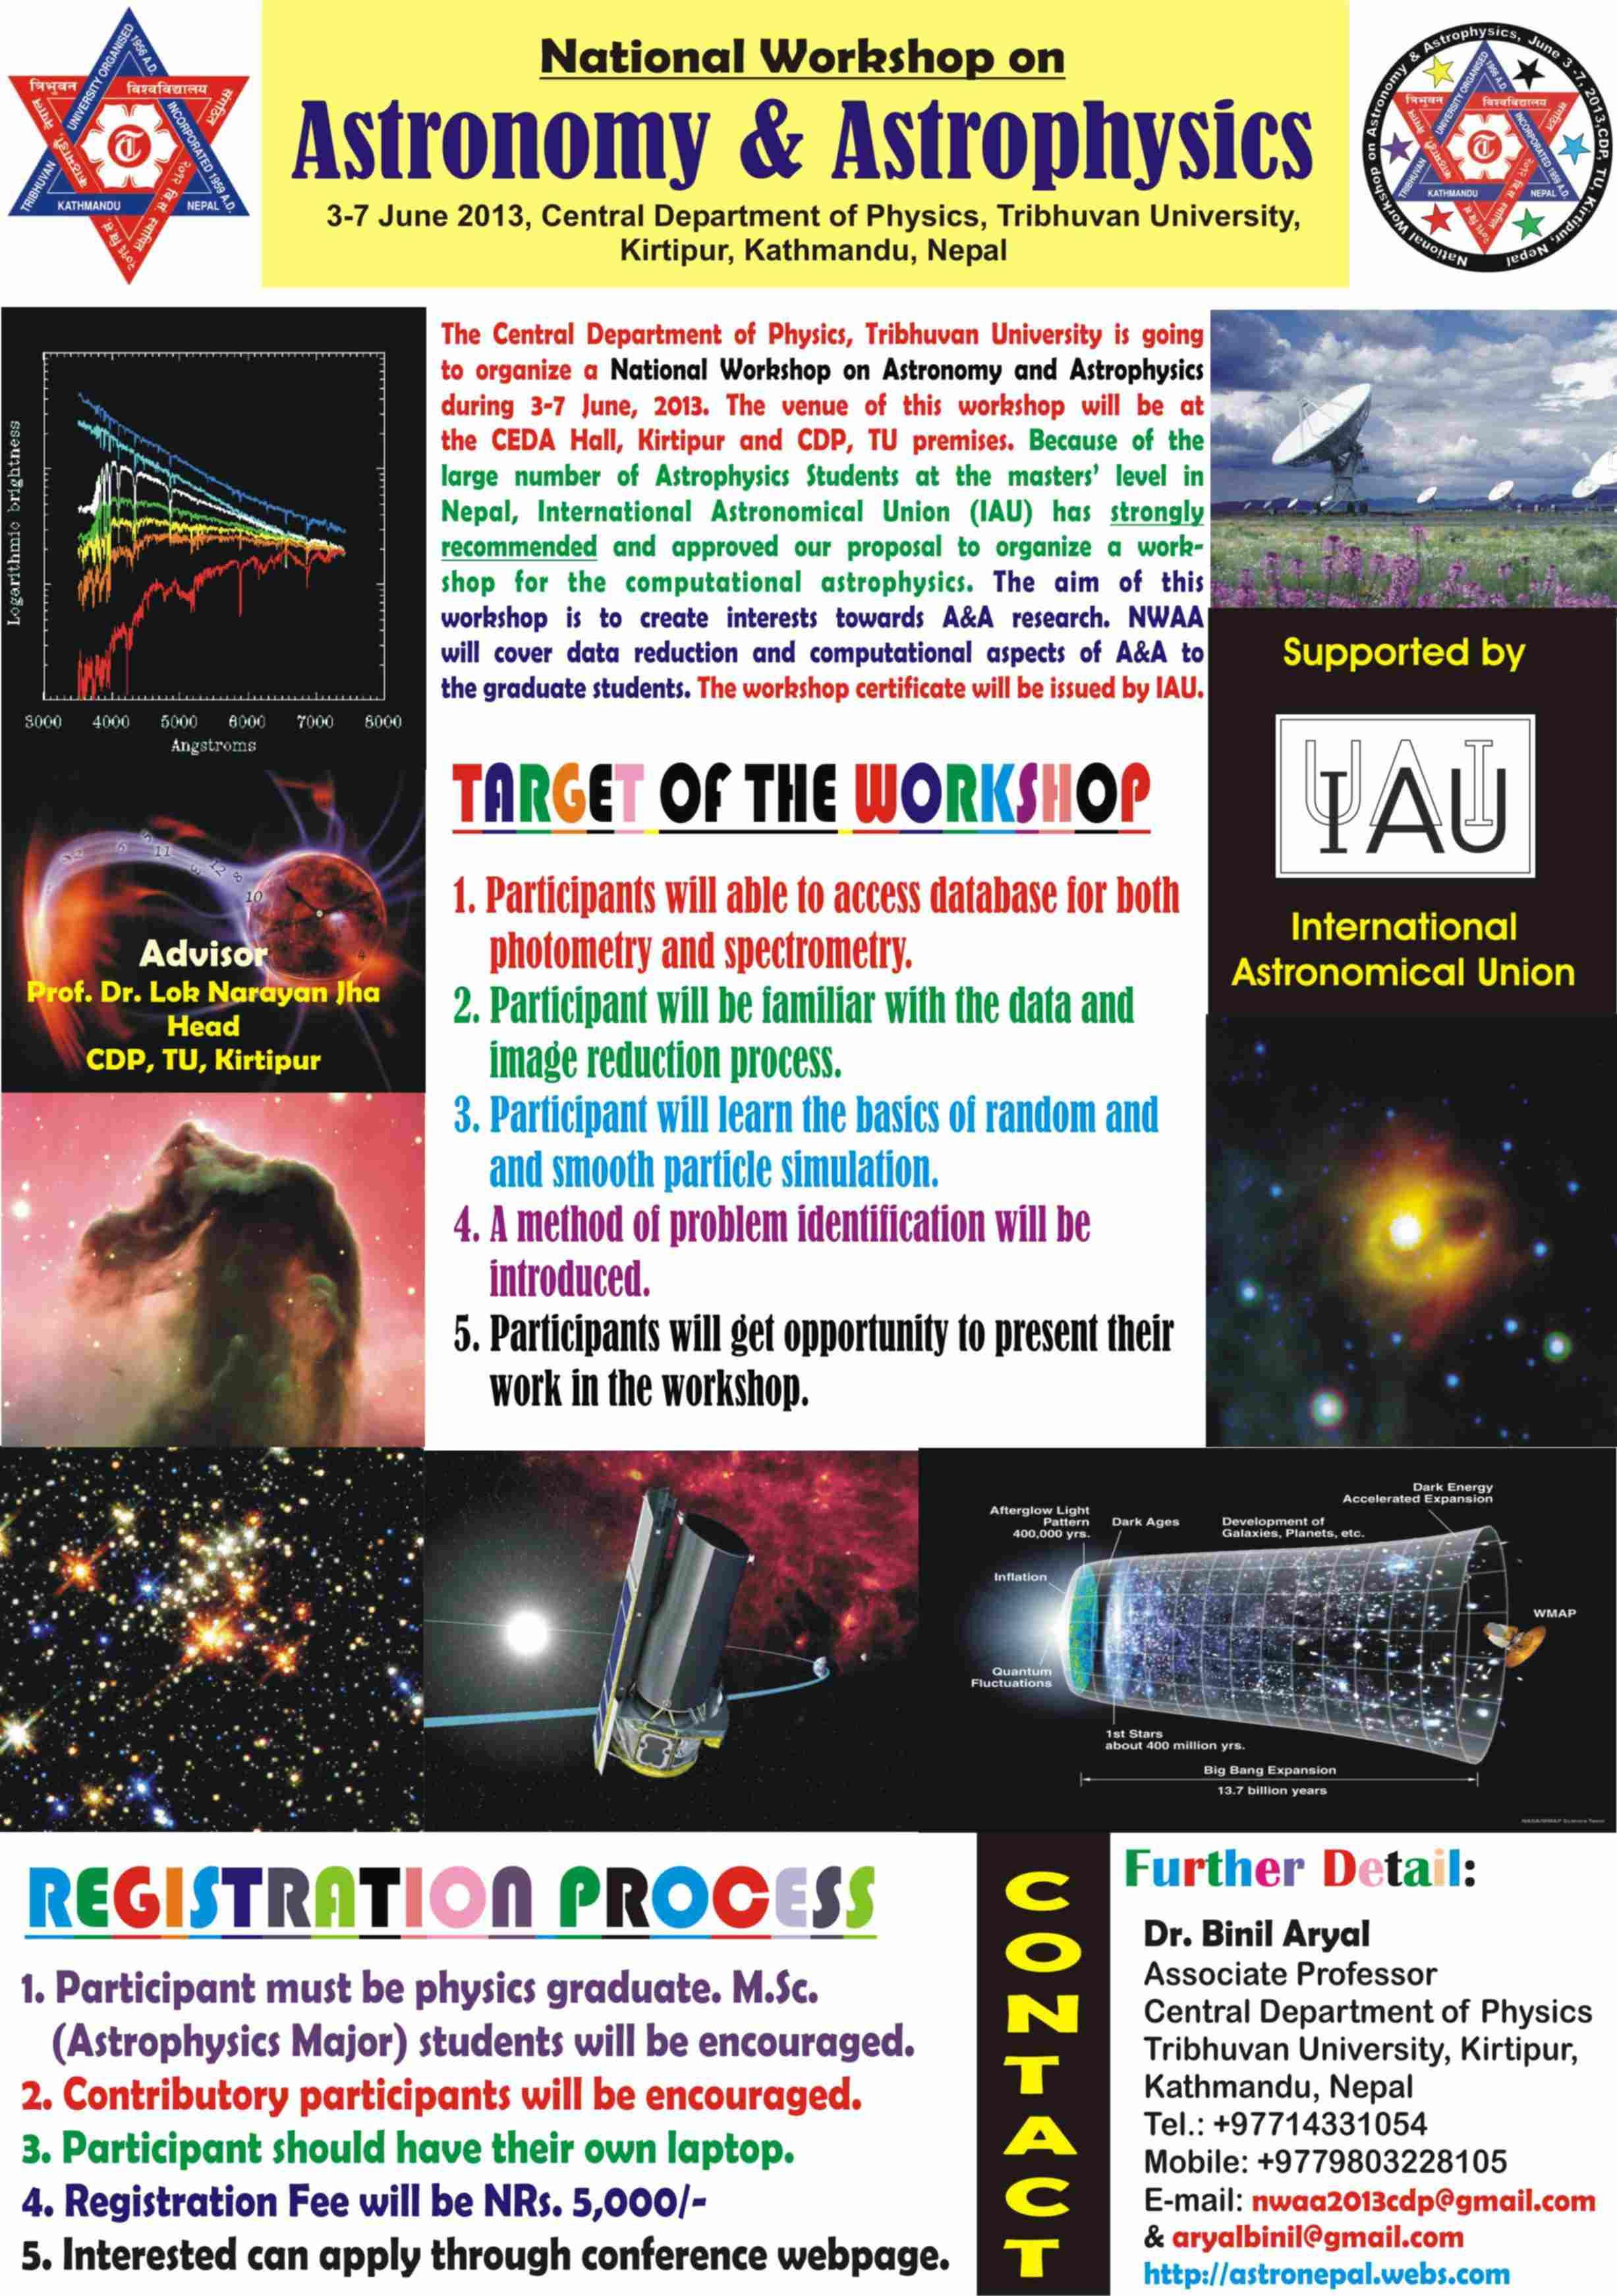 National Workshop on Astronomy & Astrophysics in Kathmandu